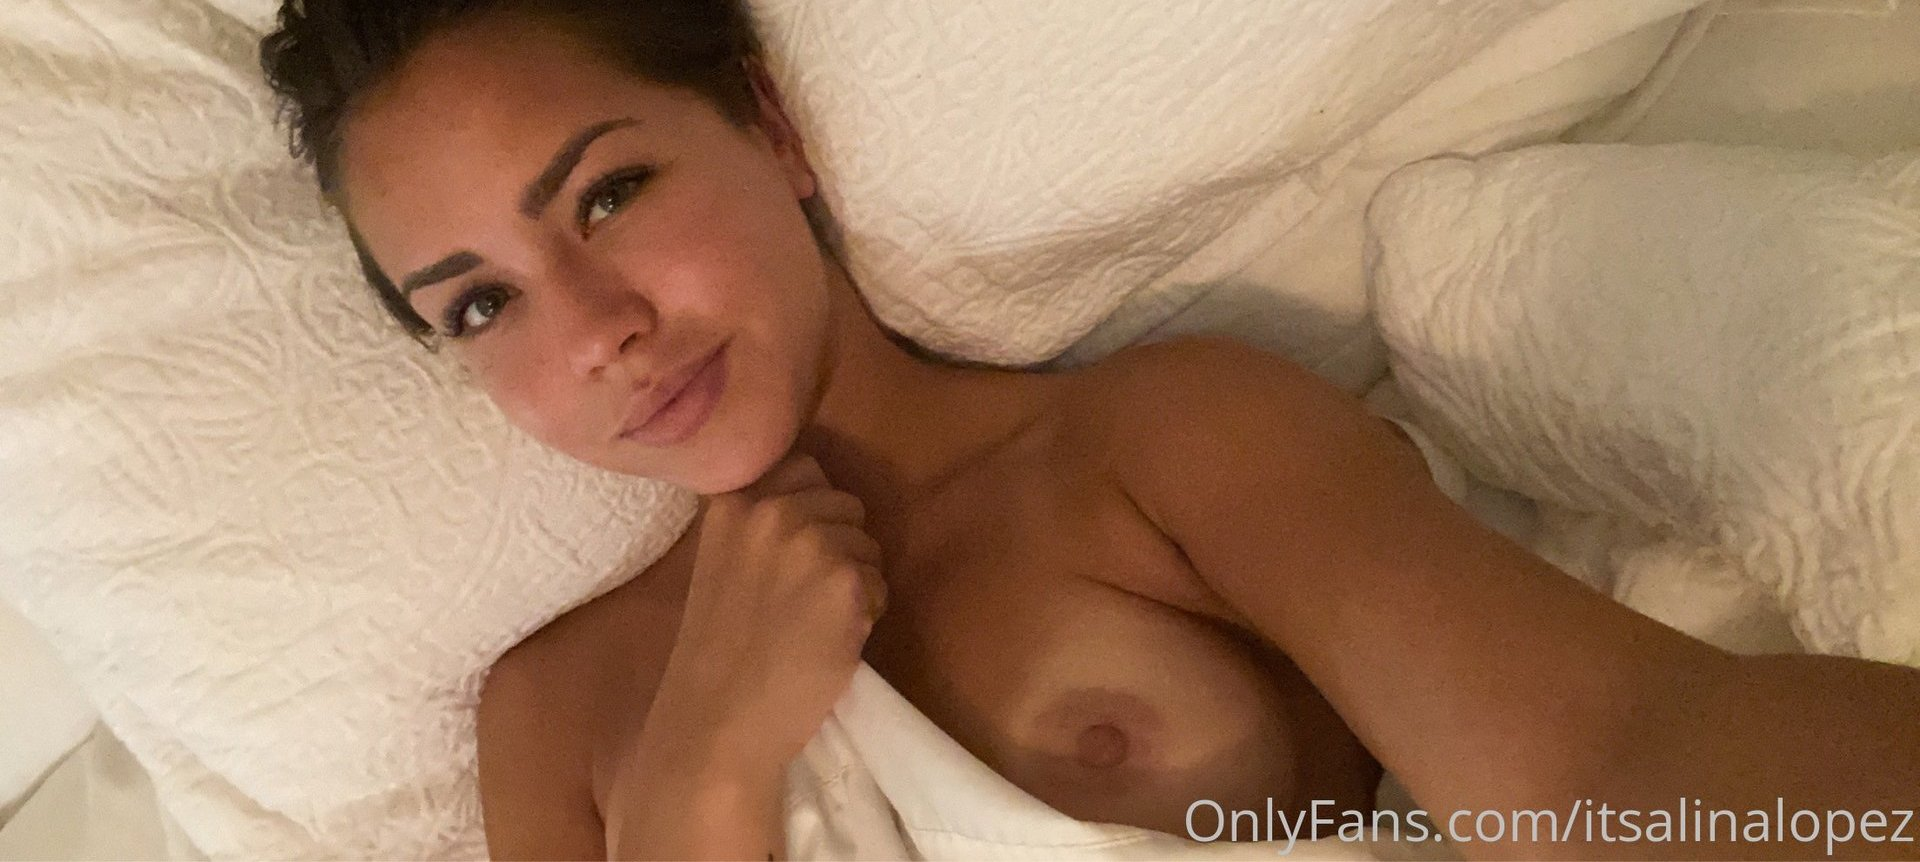 Alina Lopez Itsalinalopez Onlyfans Nude Leaks 0022